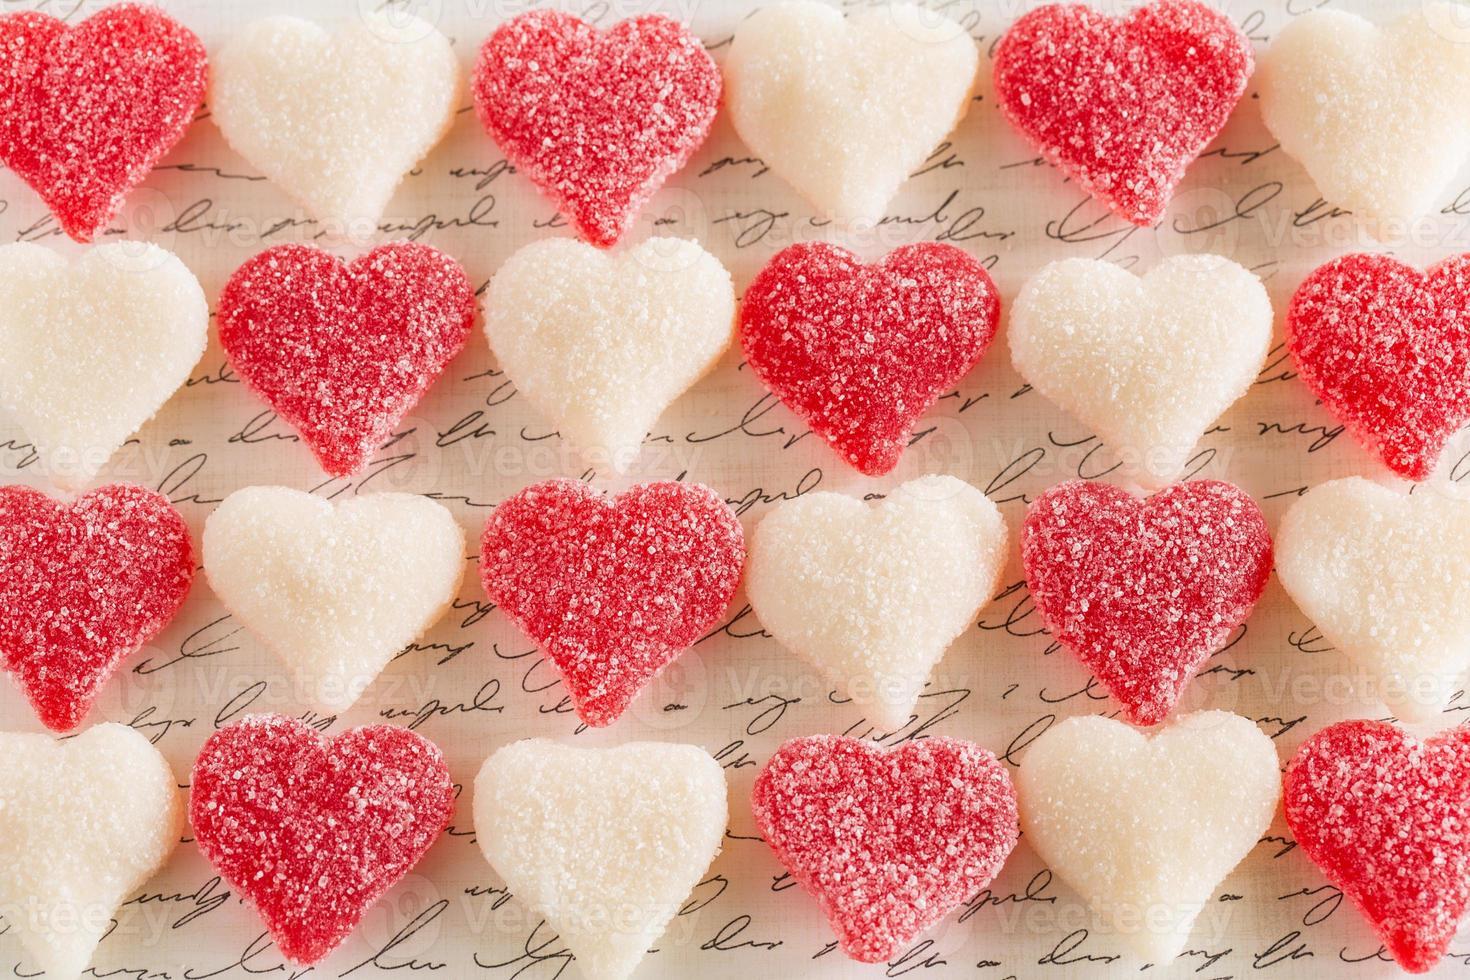 San Valentino Gummy Love Heart Candy Dessert Food foto